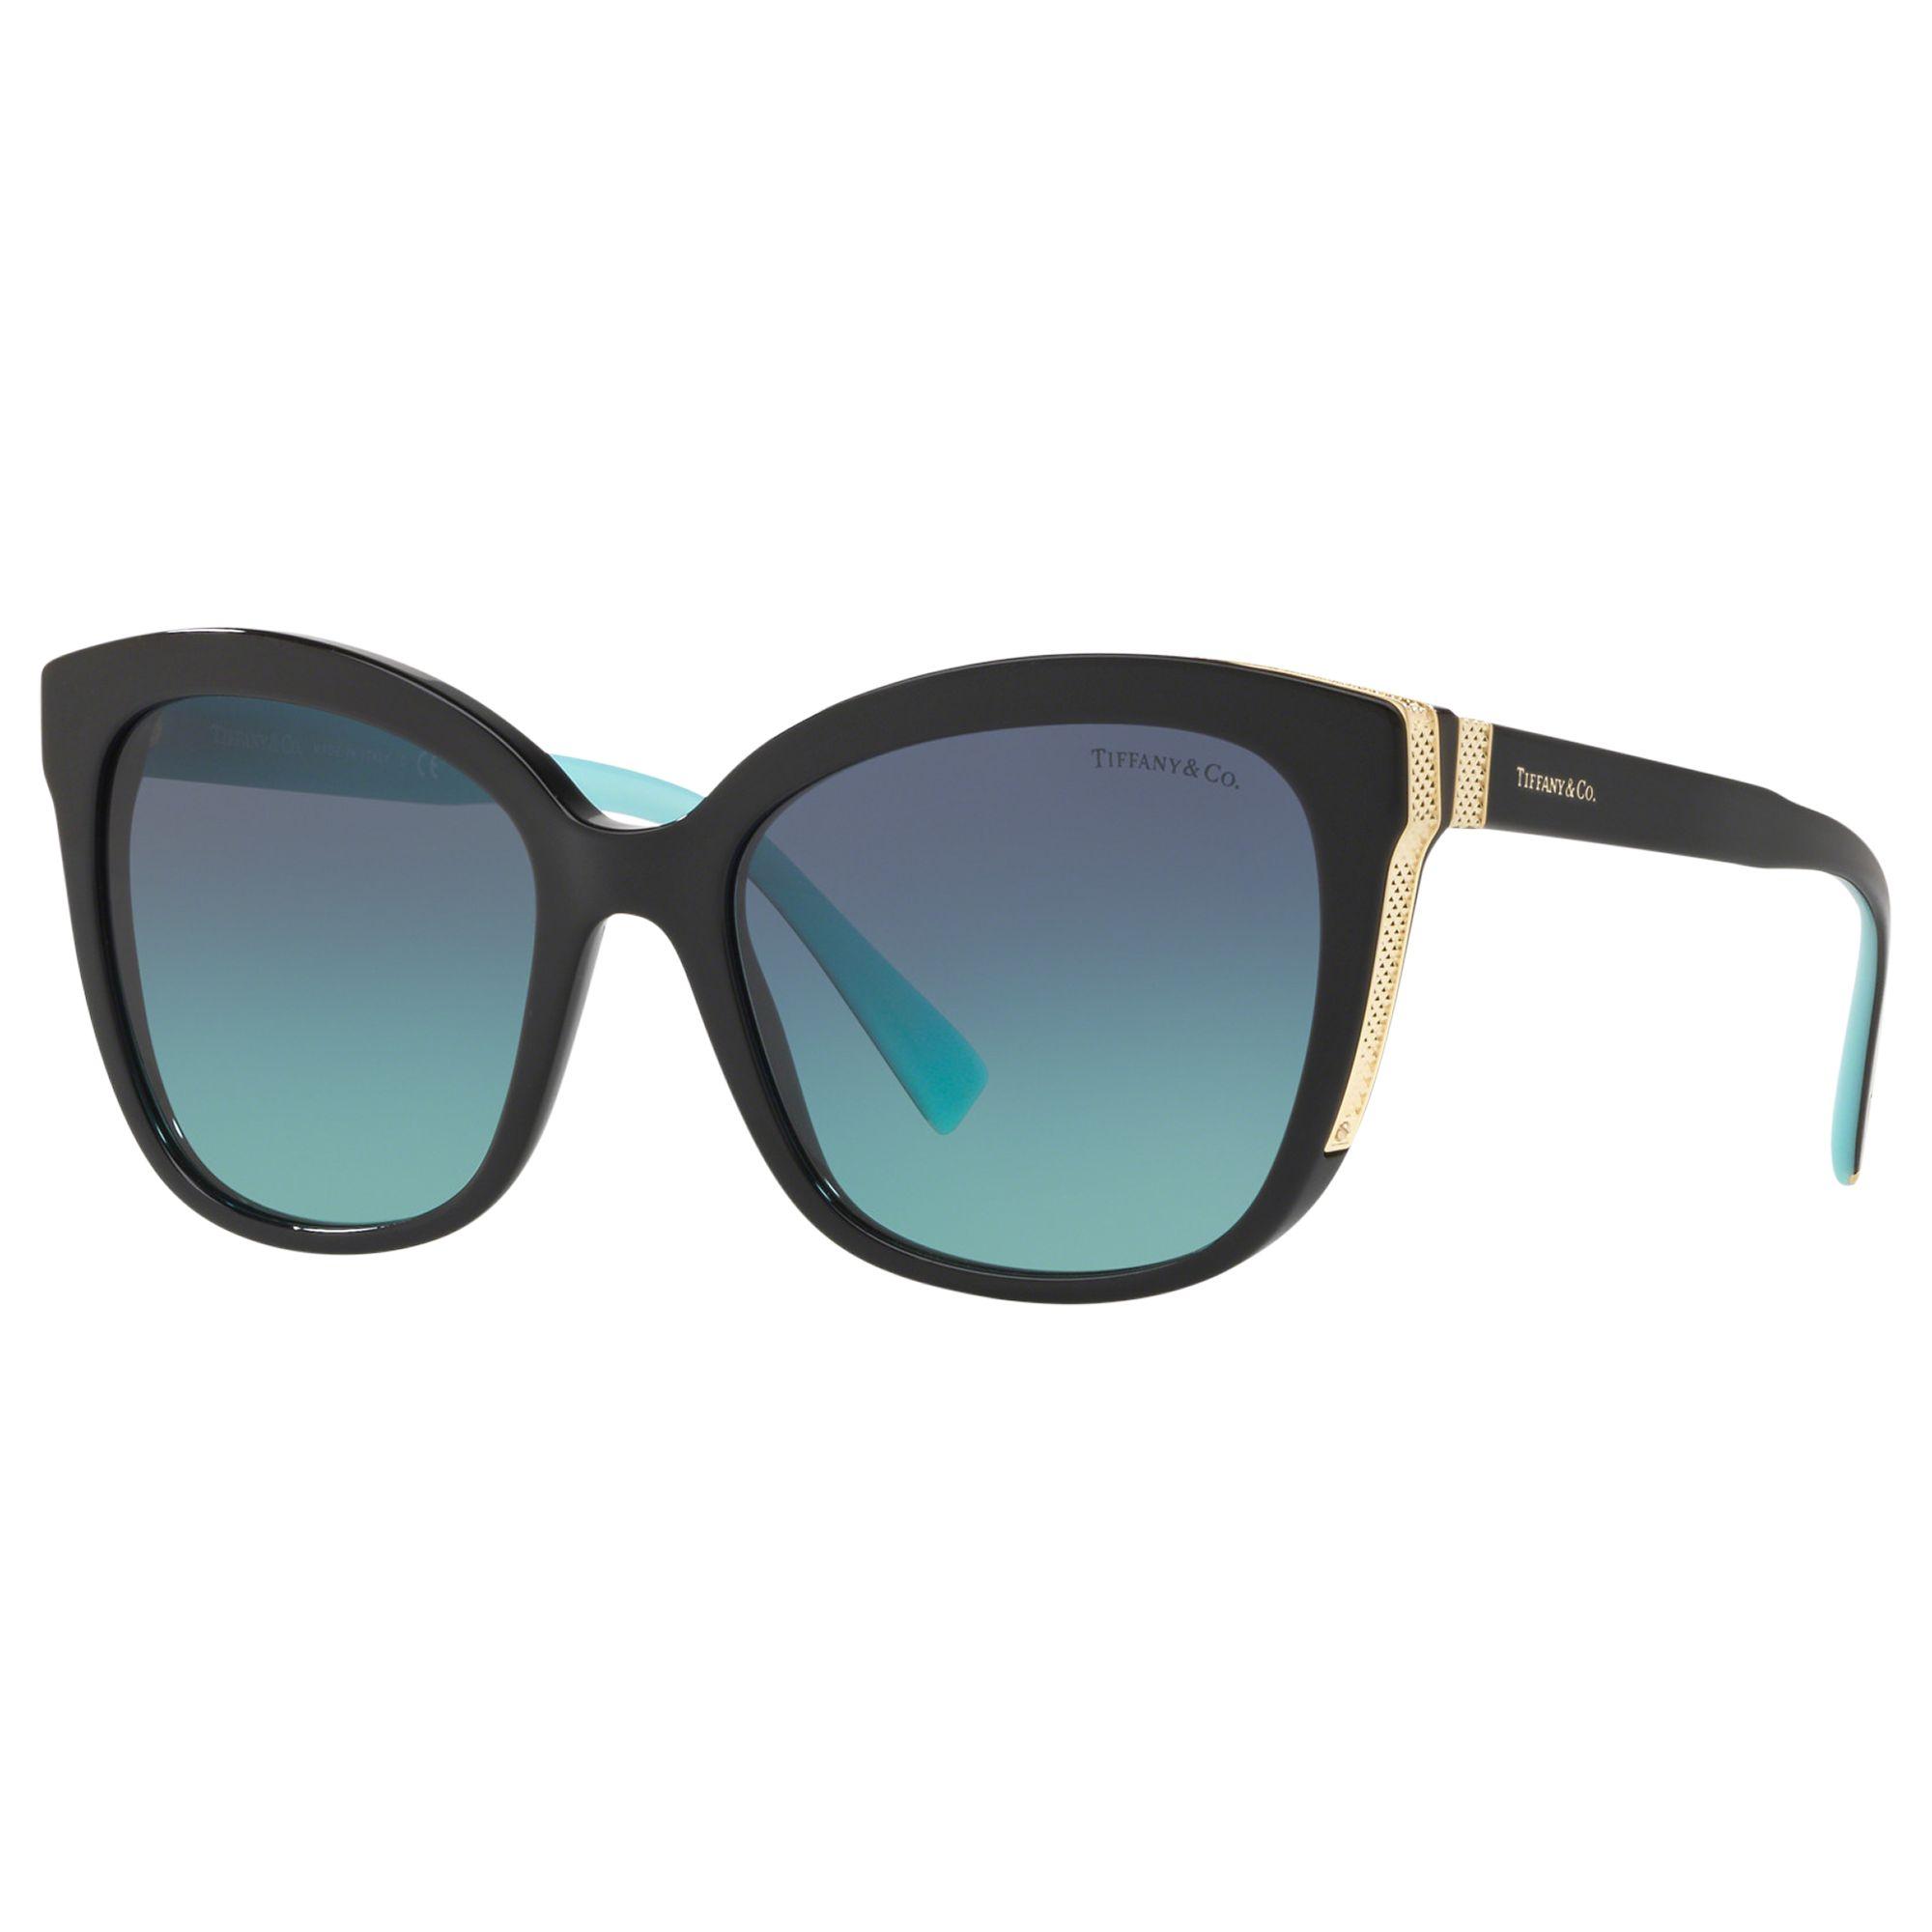 Tiffany & Co Tiffany & Co TF4150 Women's Embellished Square Sunglasses, Black/Blue Gradient